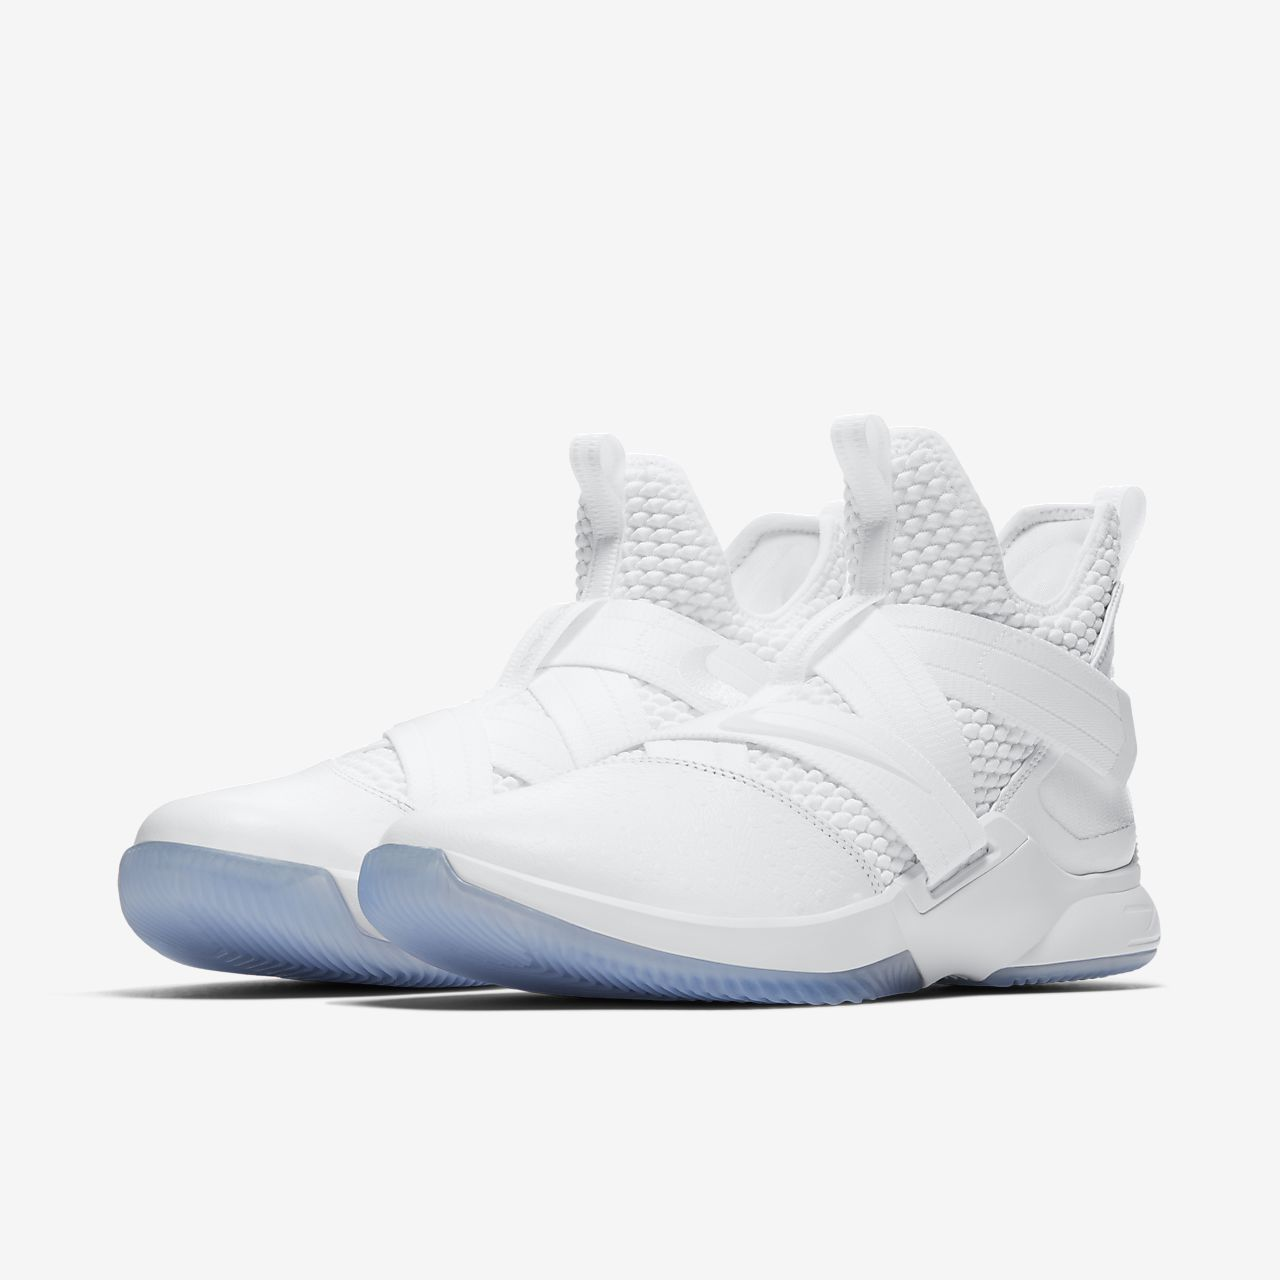 e2ee30e9fb9 LeBron Soldier 12 SFG Basketball Shoe. Nike.com CA